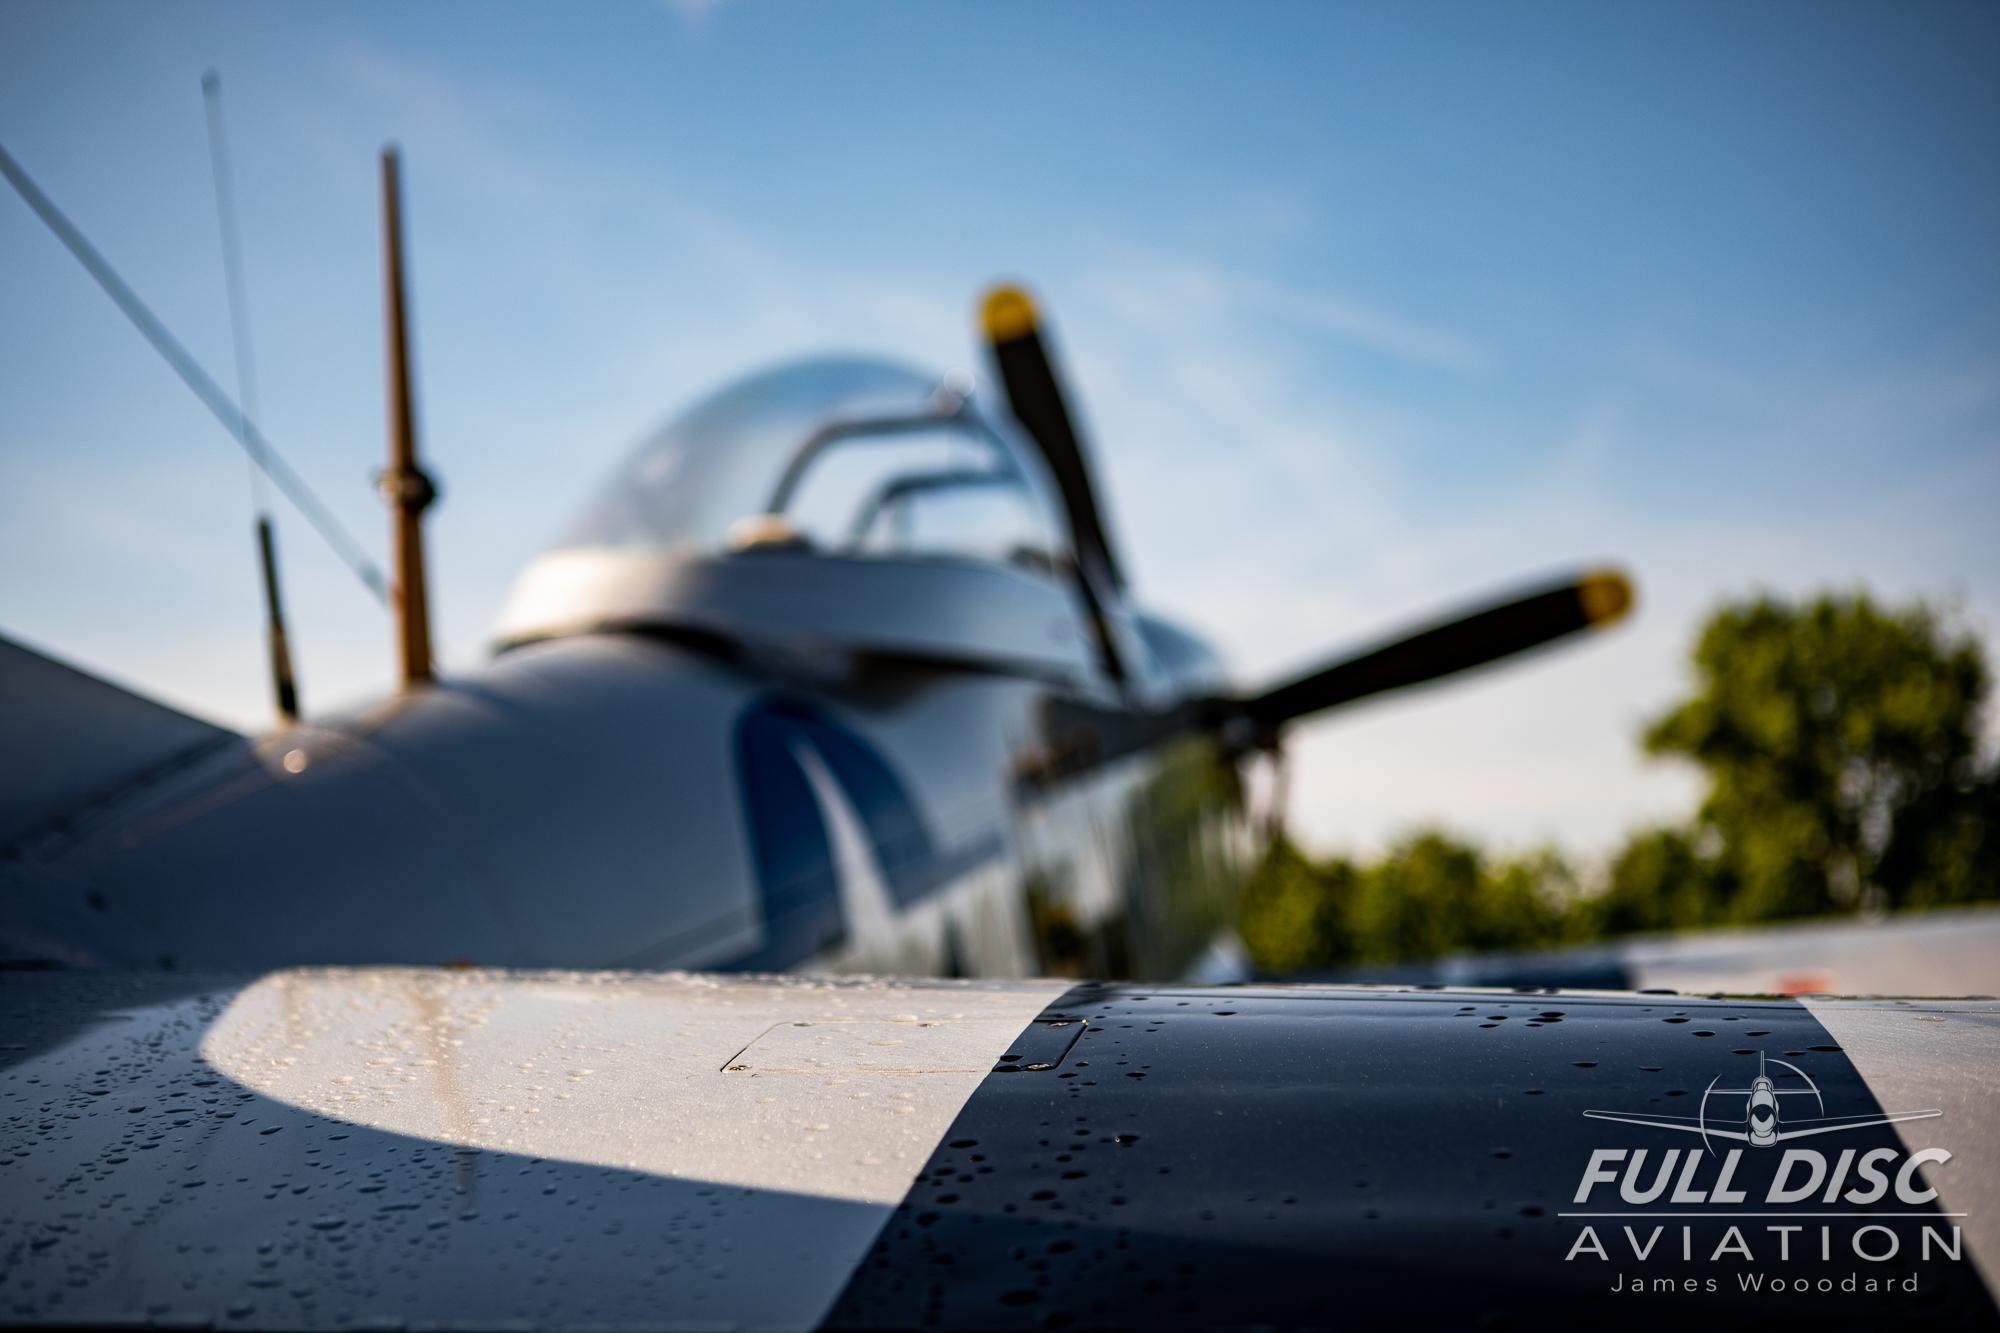 WarbirdsOverTheBeach_FullDiscAviation_JamesWoodard-May 18, 2019-38.jpg